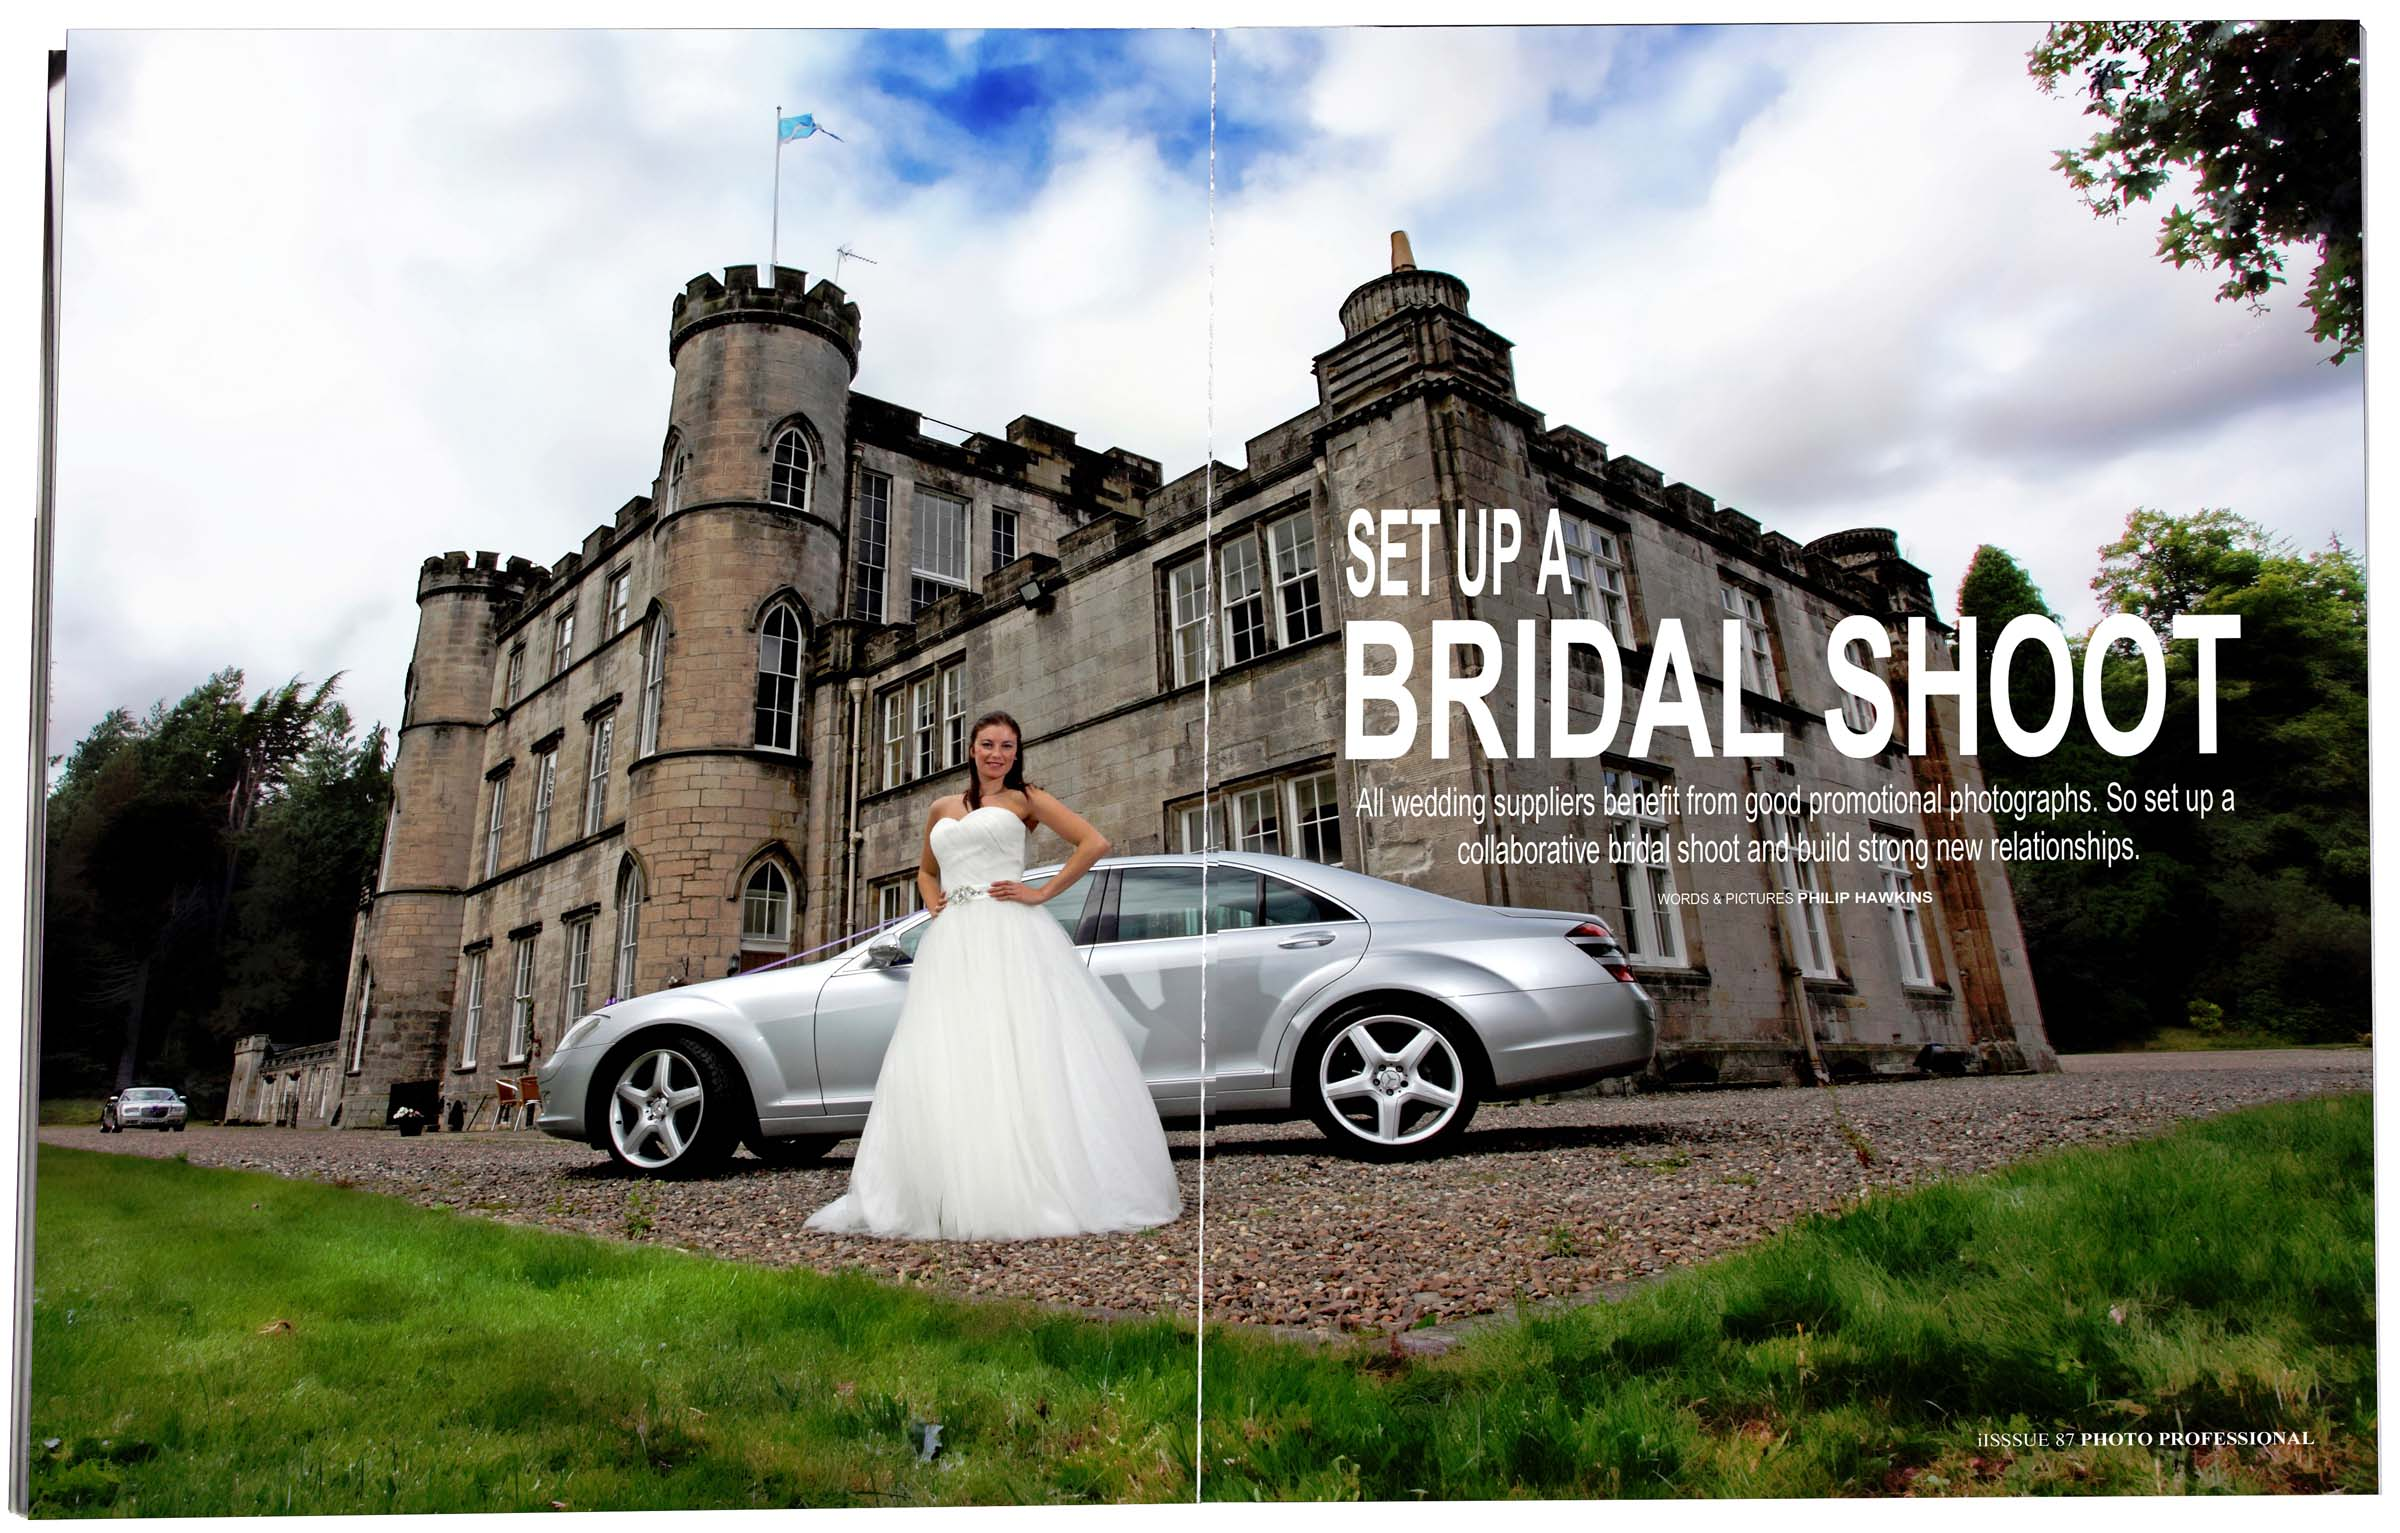 Bridal_MagSpread2.jpg